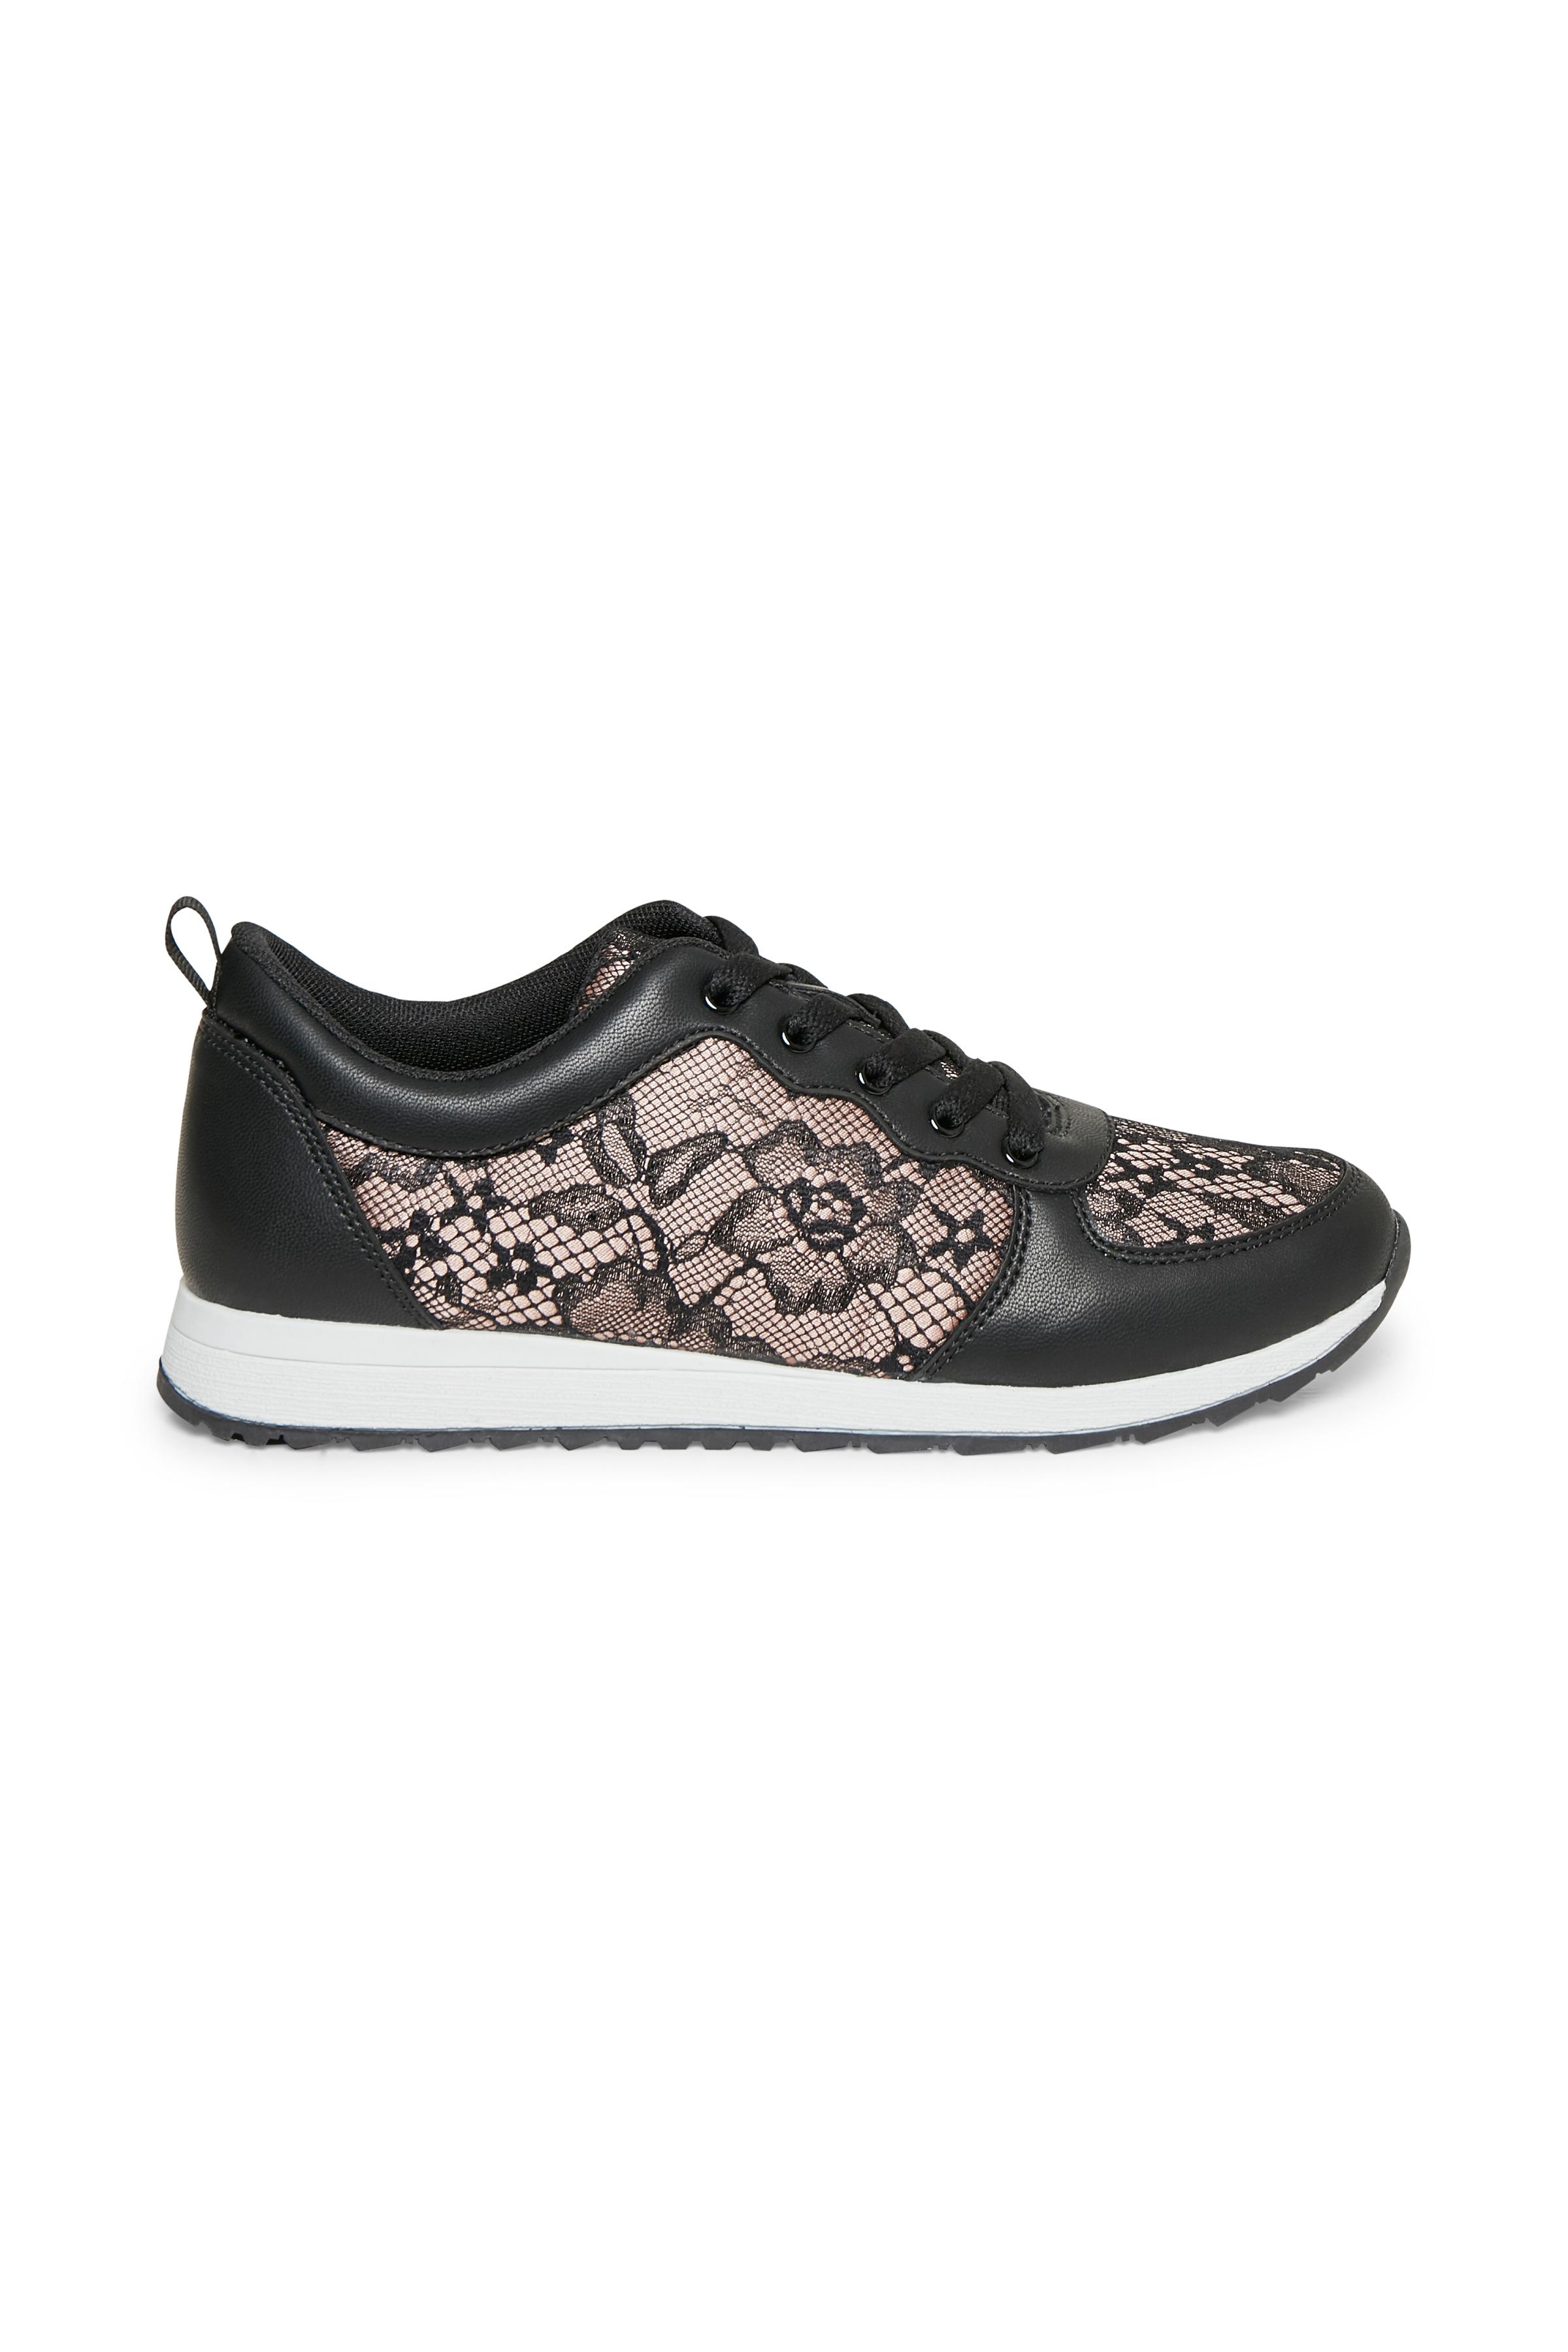 Sort Sneakers fra Cream Accessories – Køb Sort Sneakers fra str. 36-41 her